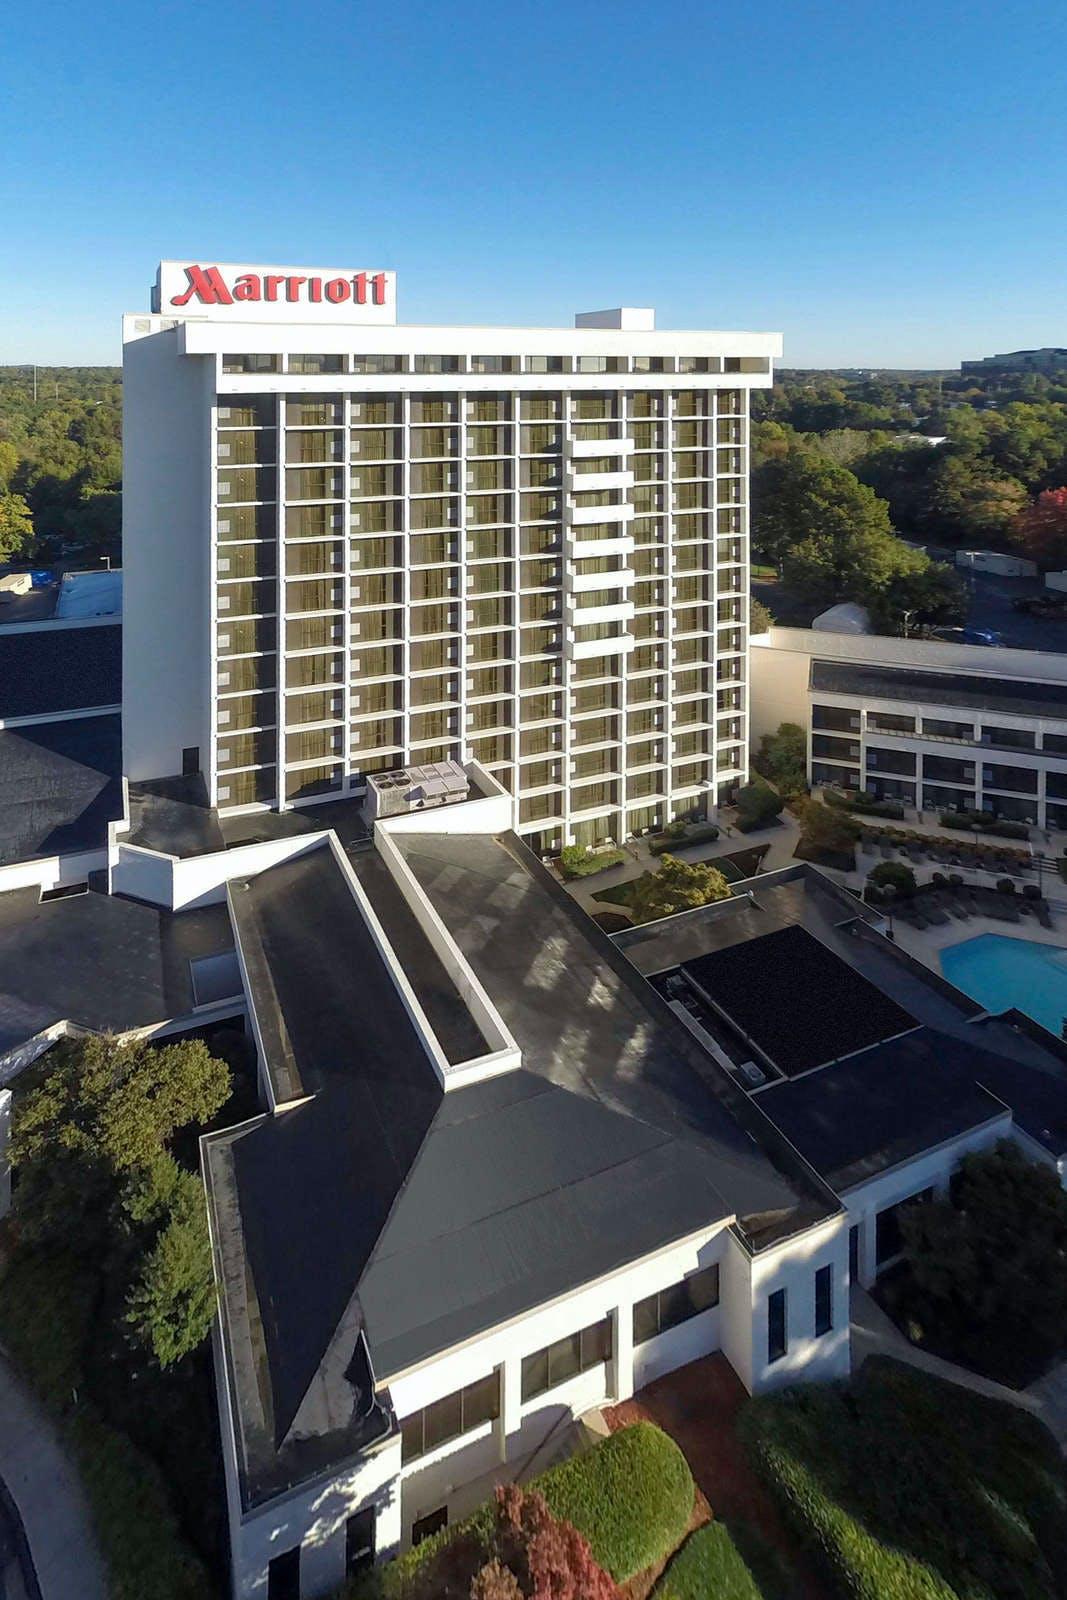 Atlanta Marriott NW at the Galleria